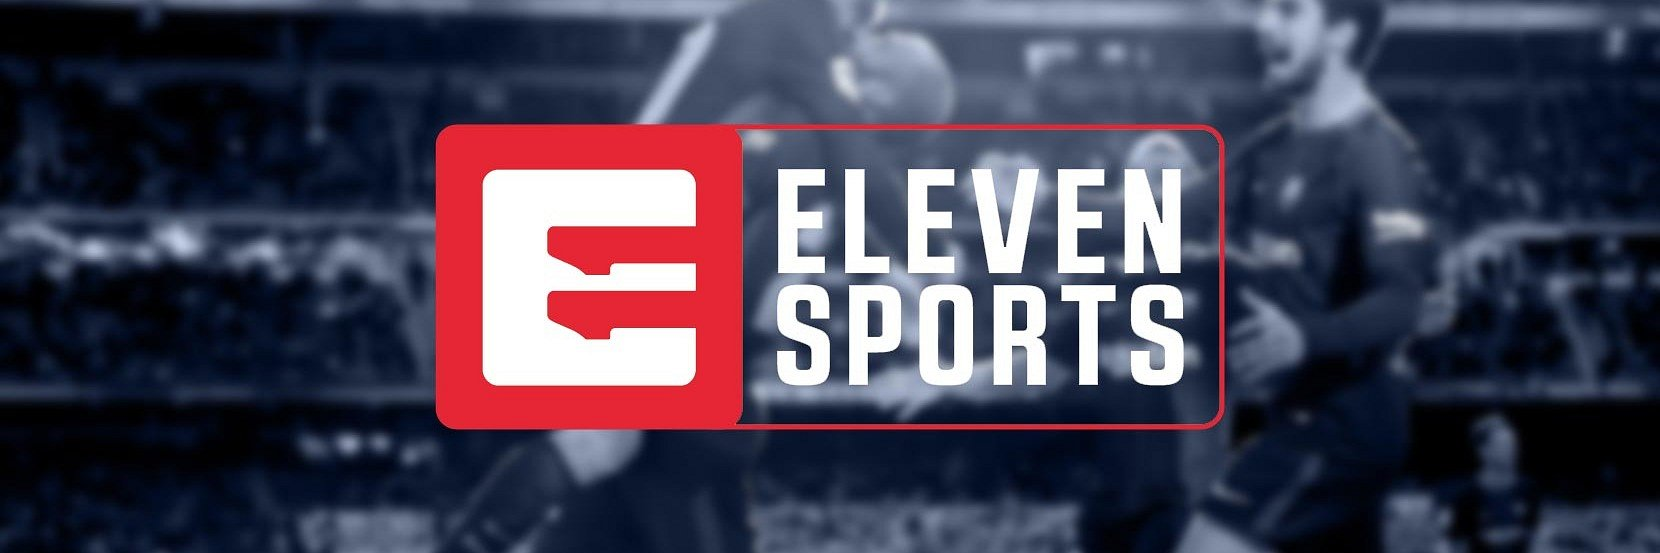 Reminder | Convite Eleven Sports: Torneio de Padel CasinoSolverde.pt Triple Crown, 9 a 12 de maio